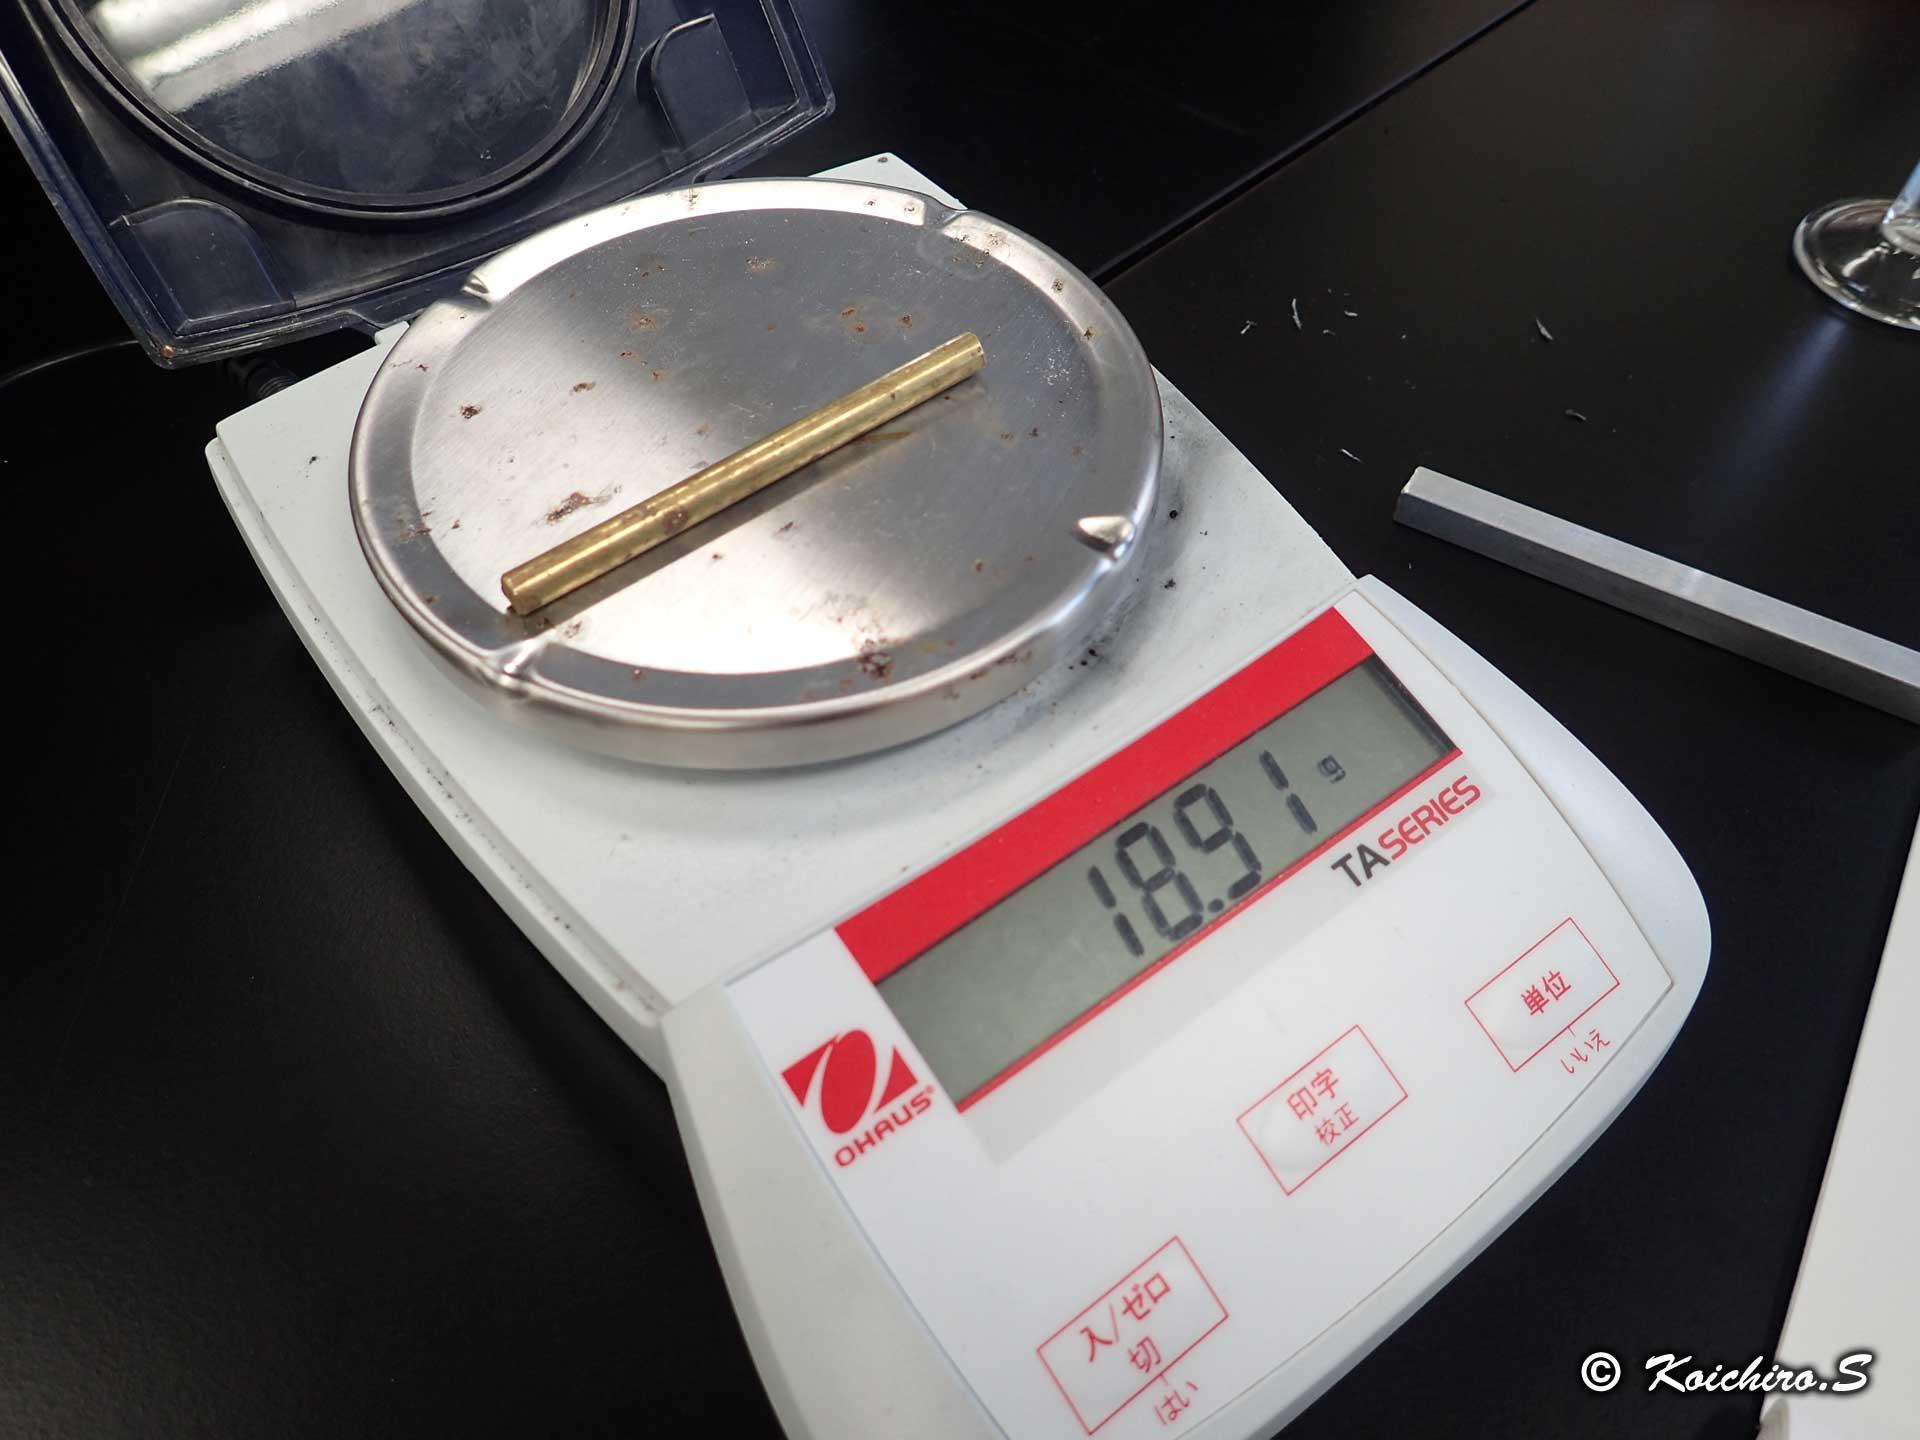 金屬の密度 - K's理科実験室 ~K's Science Lab~